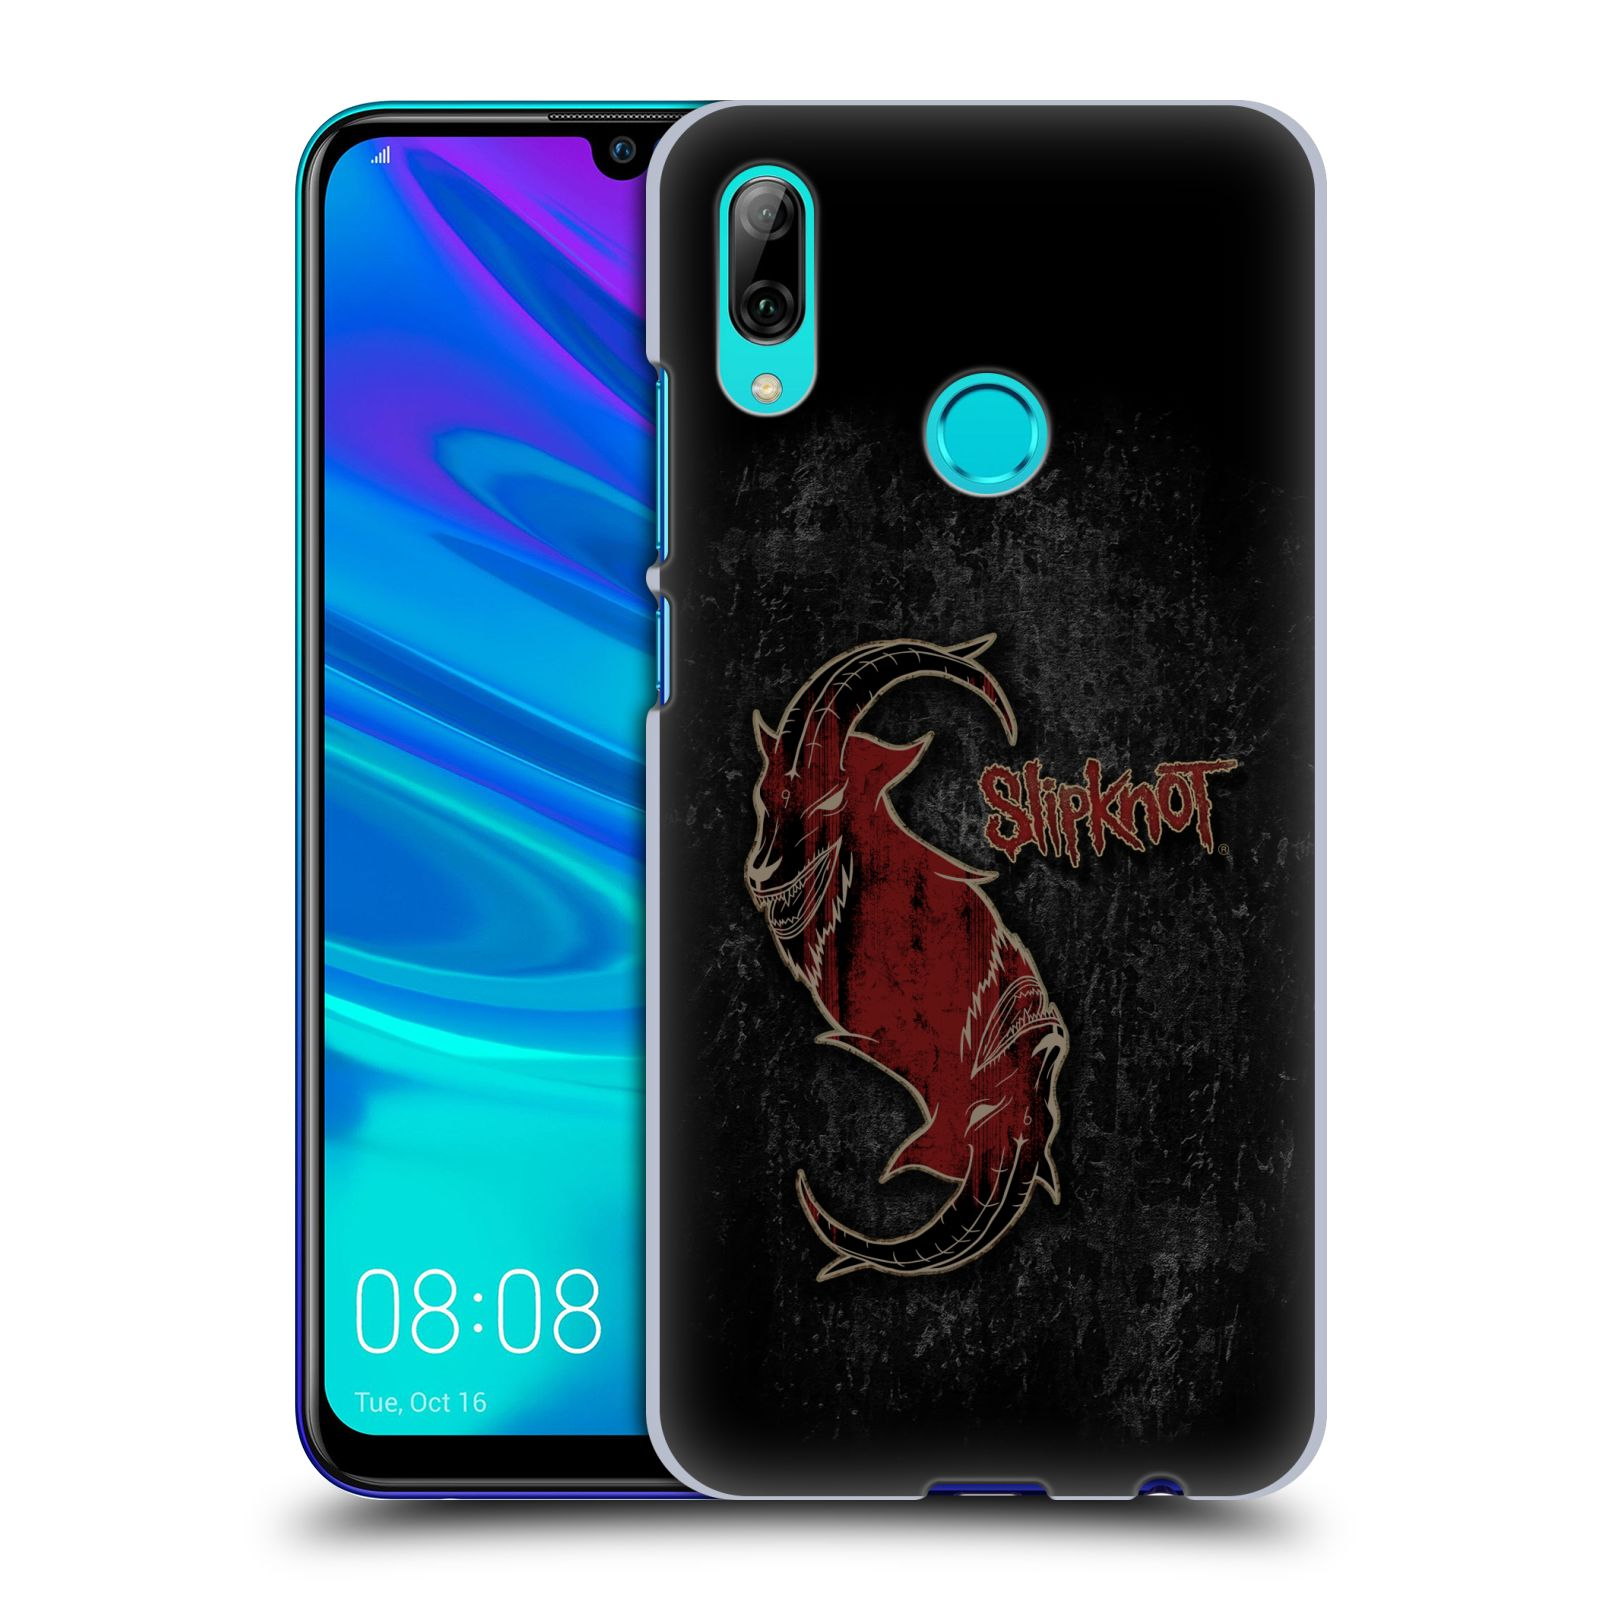 Plastové pouzdro na mobil Honor 10 Lite - Head Case - Slipknot - Rudý kozel